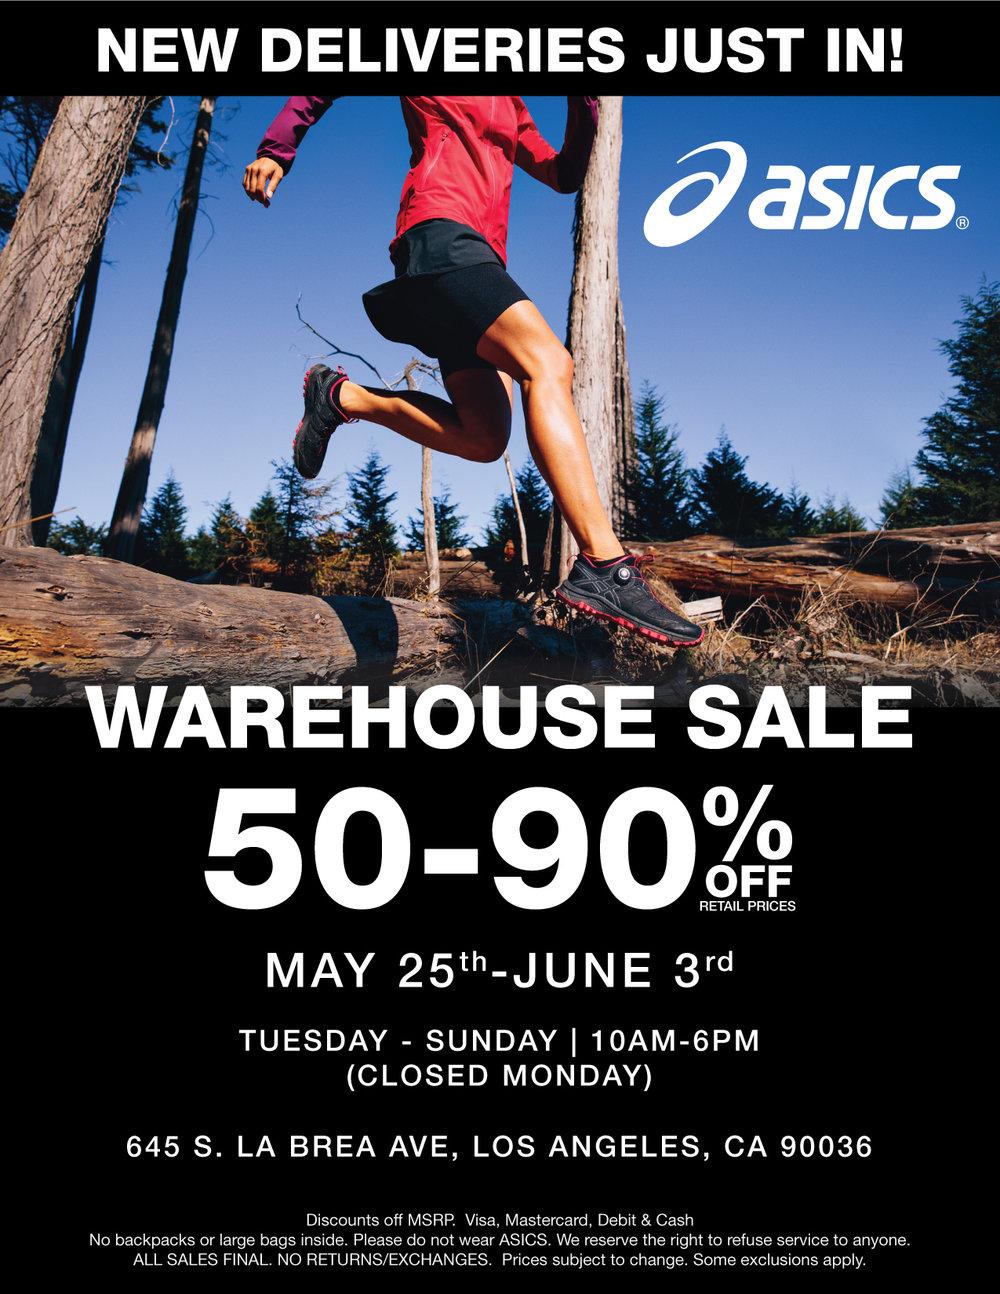 18-0525-ASICS-LA-new-deliveries-just-in-flyer-r1.jpg